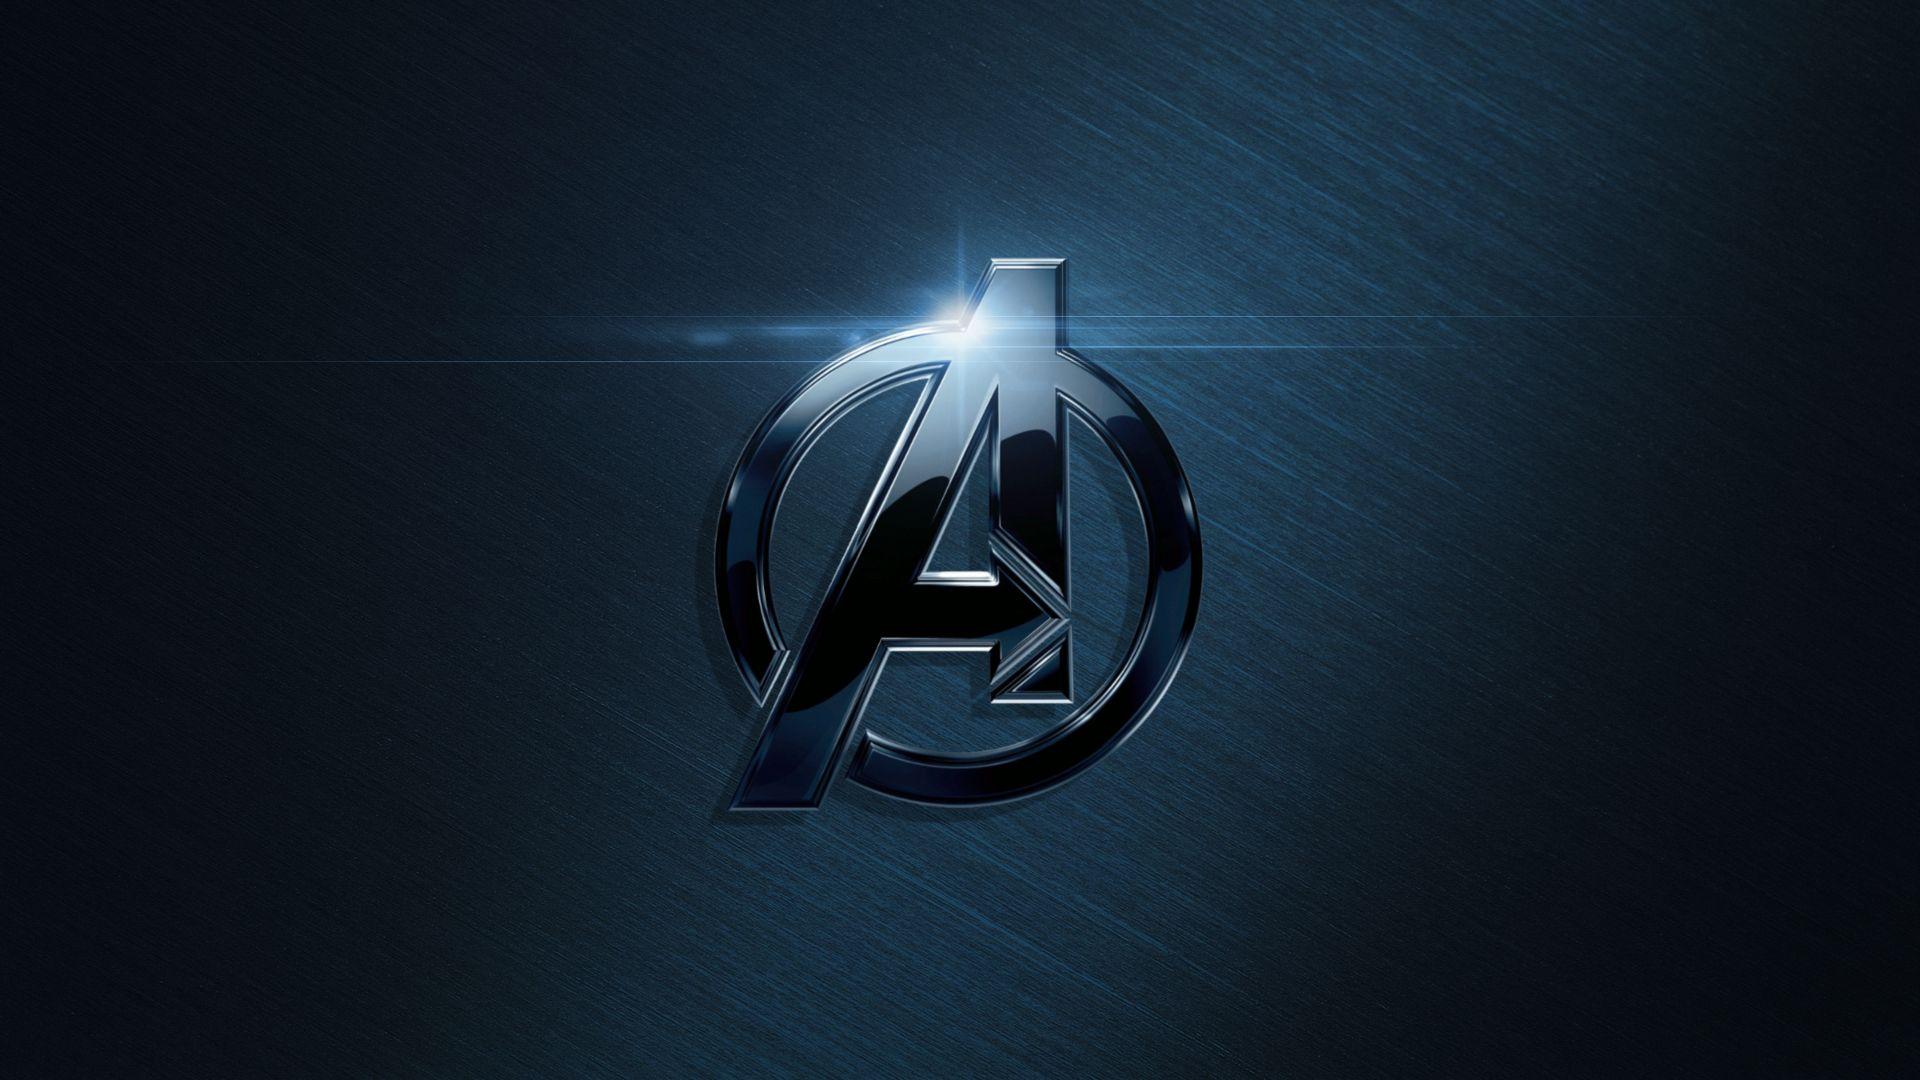 Pin by Cndadu on Wallpaper Logo wallpaper hd, Avengers